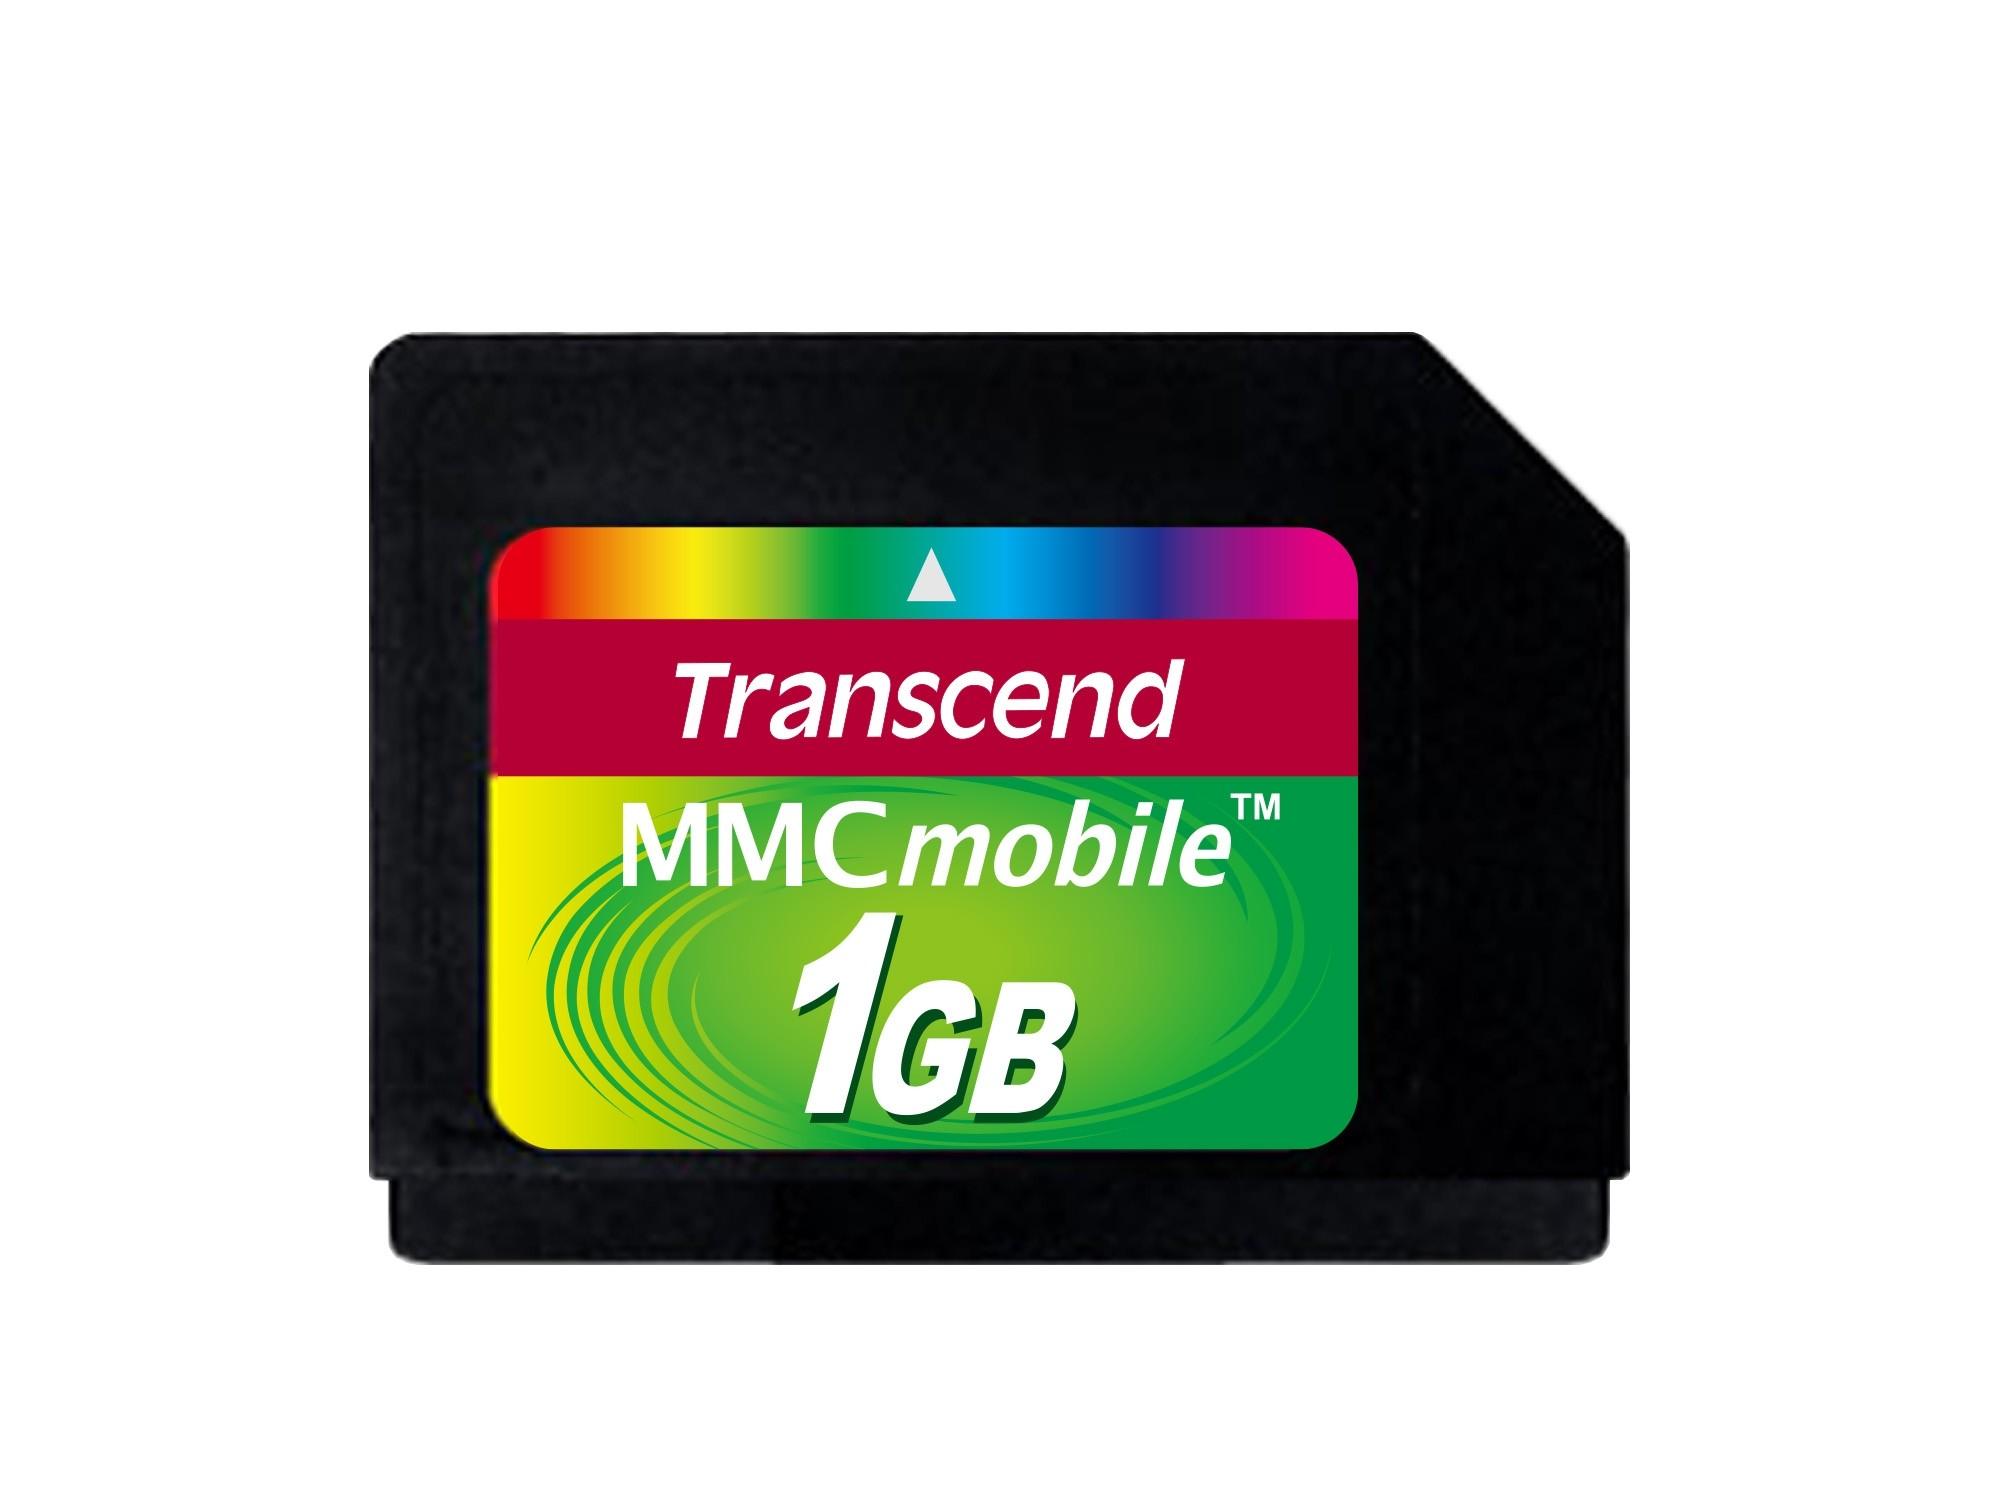 Карта пам'яті TS1GRMMC4 - Transcend 1GB MMCmobile (RS-MMC)